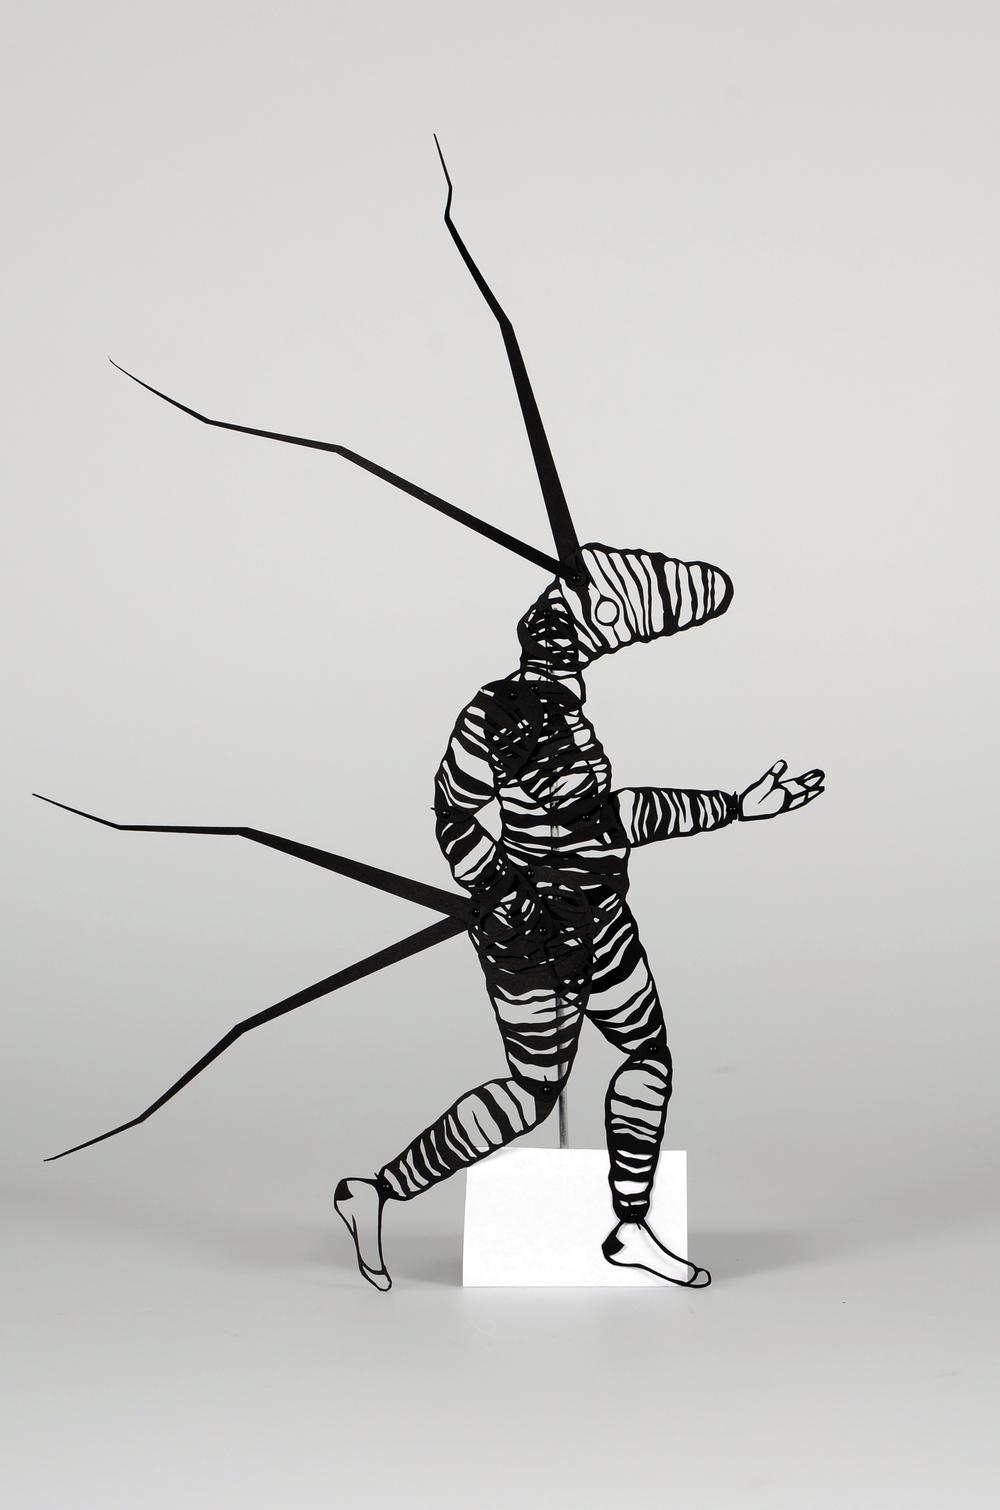 Imaginal Stasis Catter Sapien